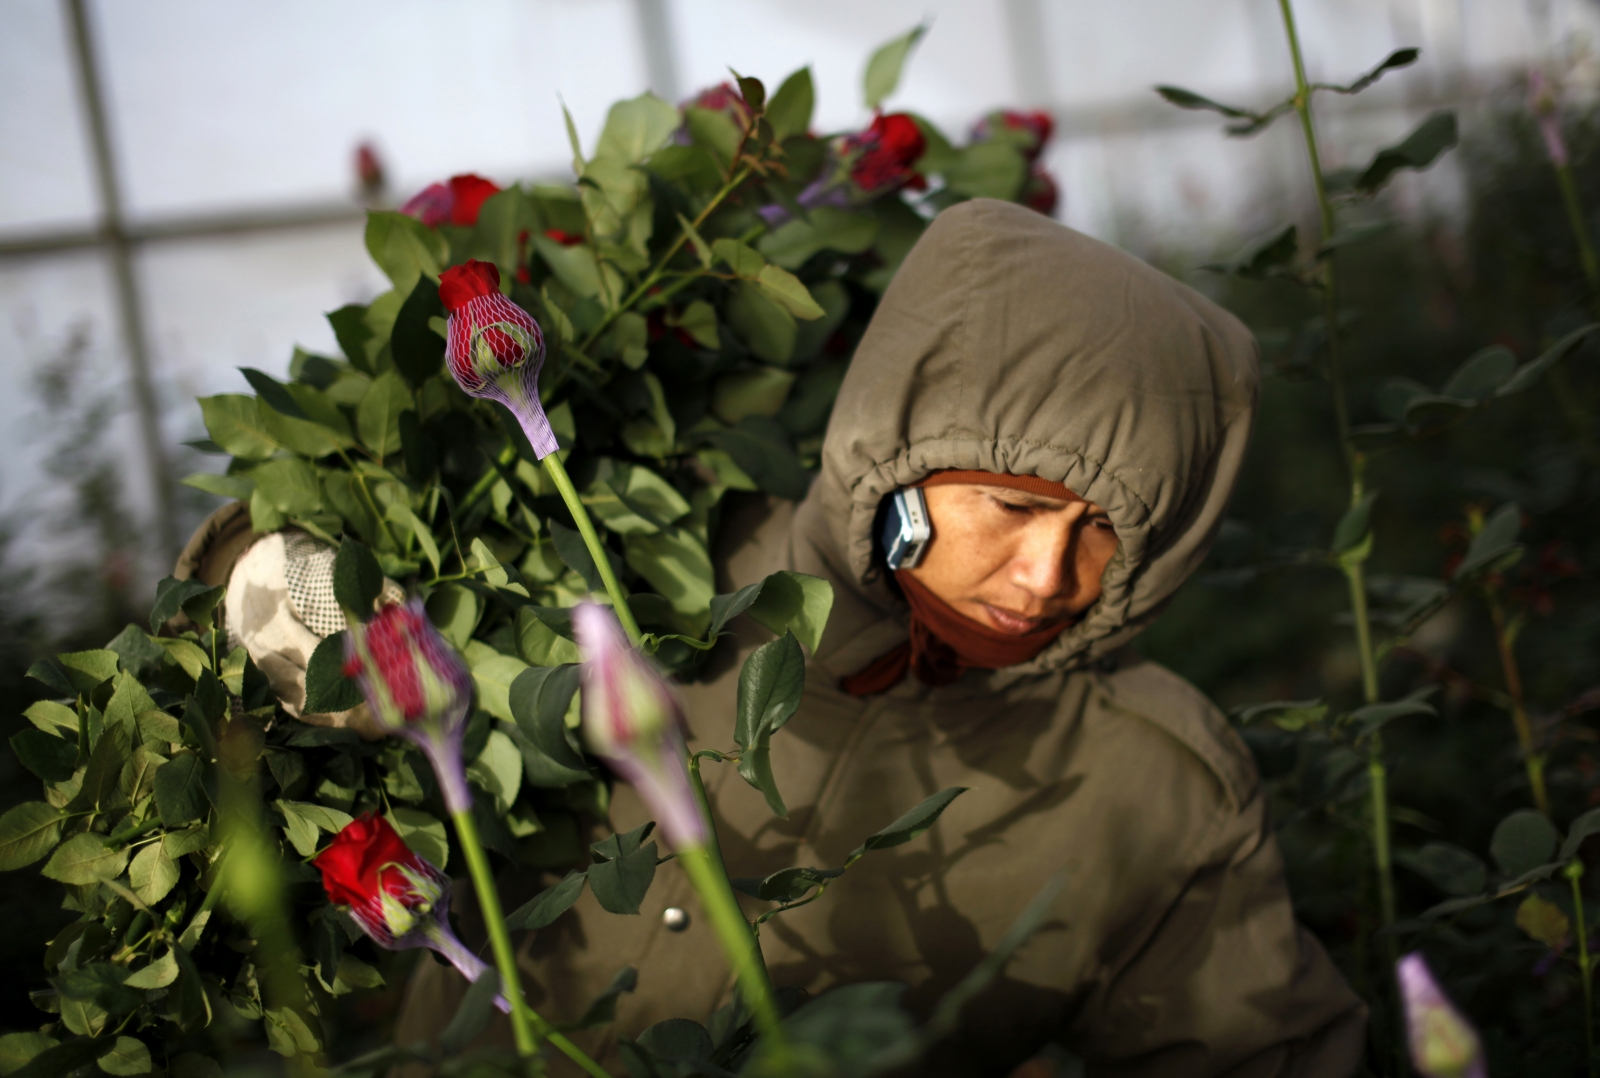 Israel Thai labourer